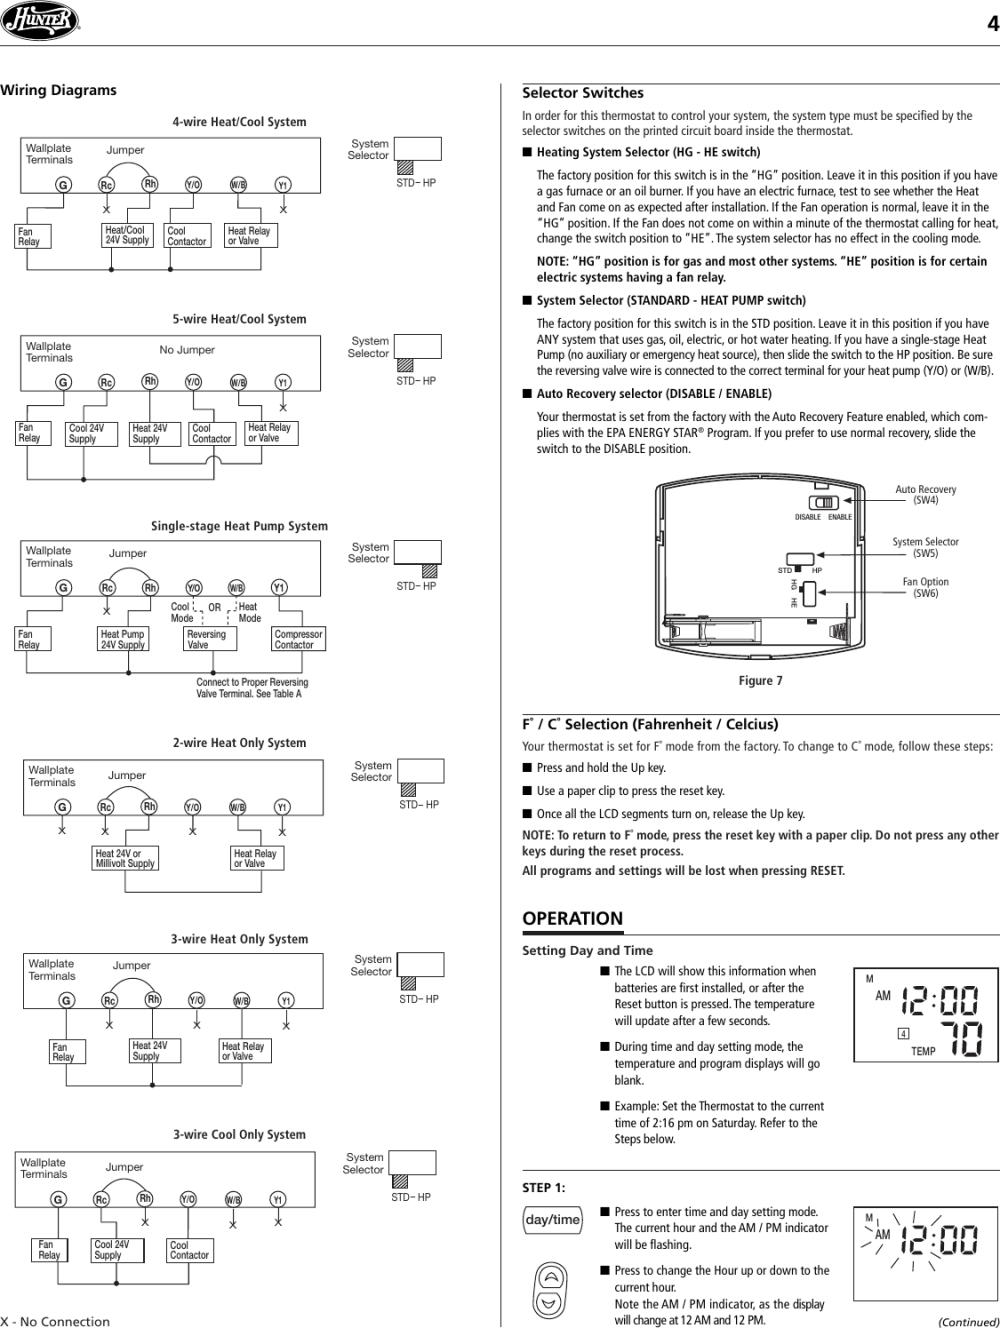 medium resolution of hunter fan 44260 users manual 41640 44260 web pmd coleman thermostat wiring diagram hunter thermostat 44260 wiring diagram 2wire